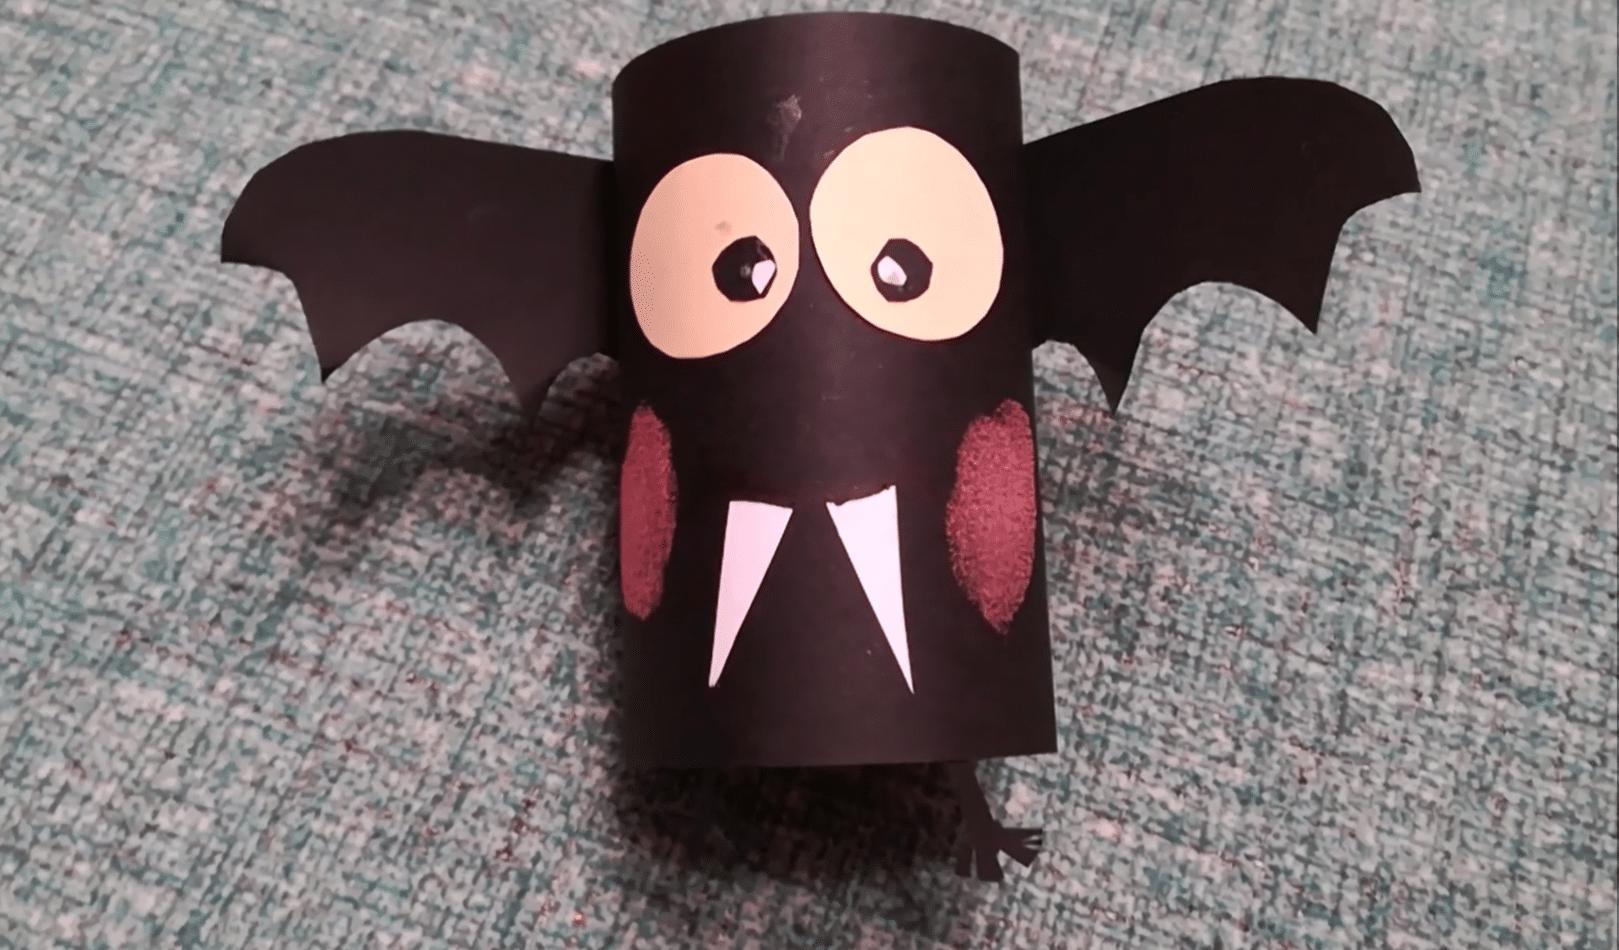 Murciélago rollos de papel